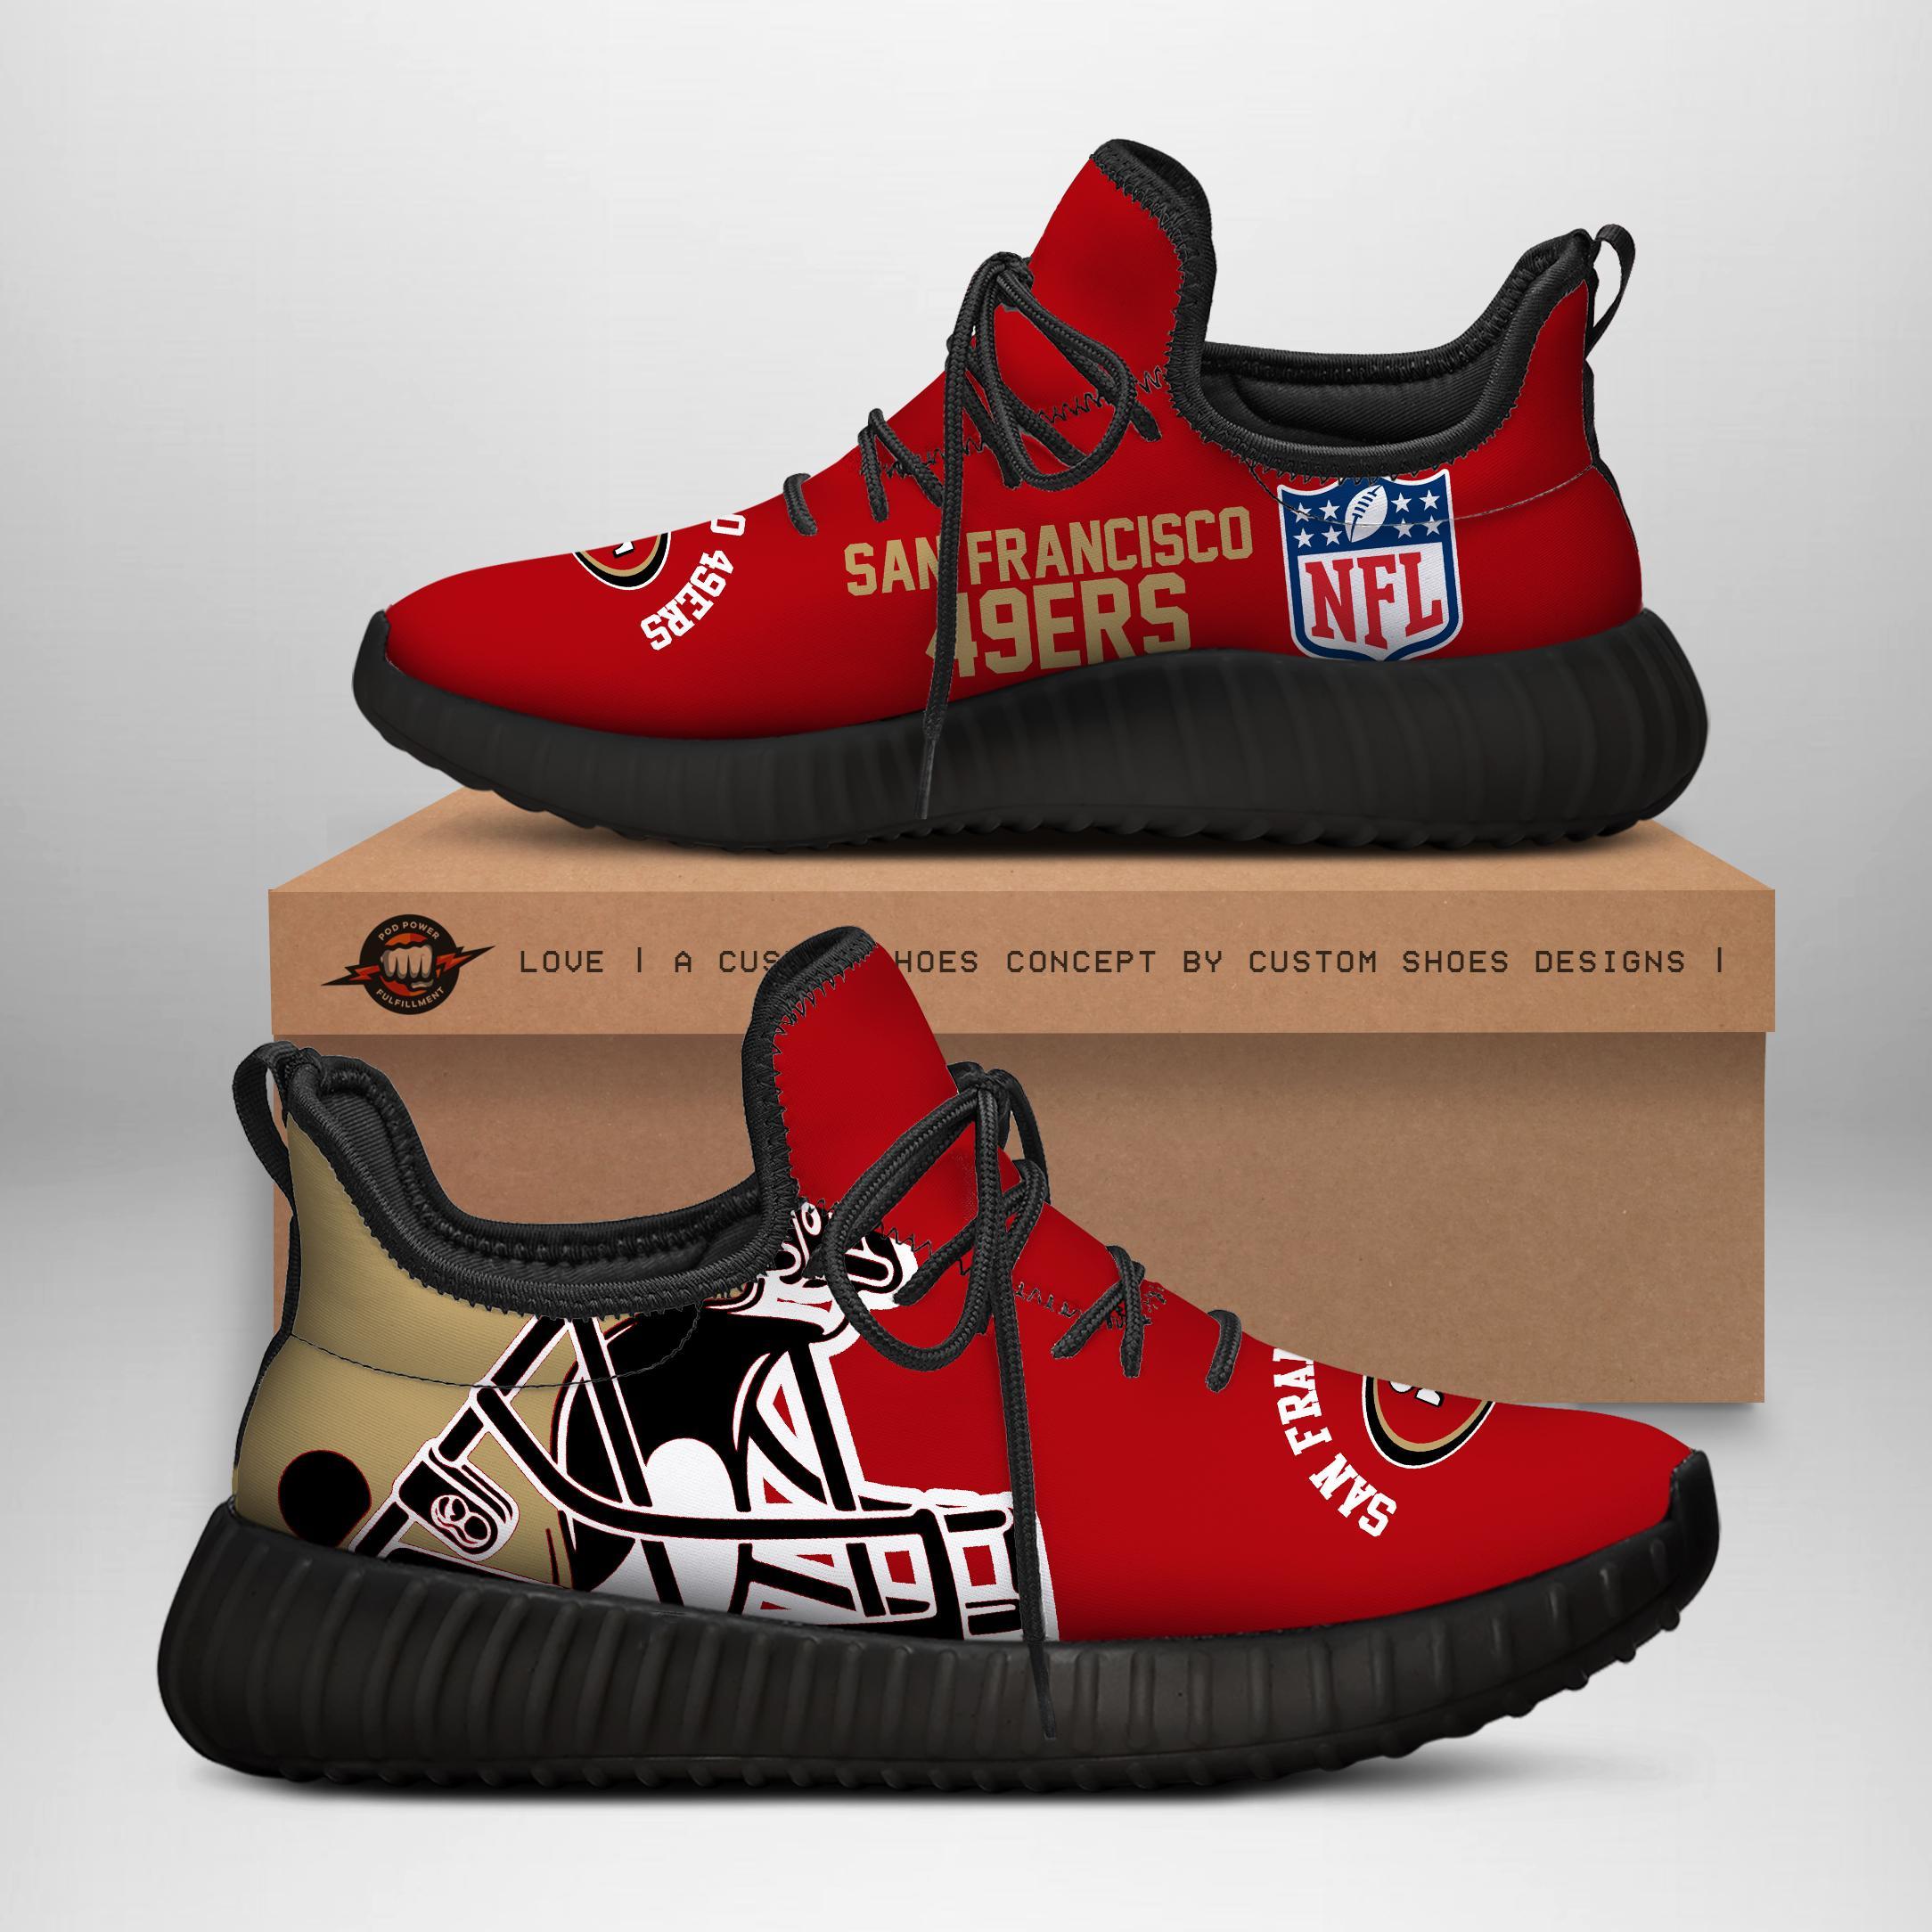 49ERS Custom New Yeezy Sneaker SNEAKER